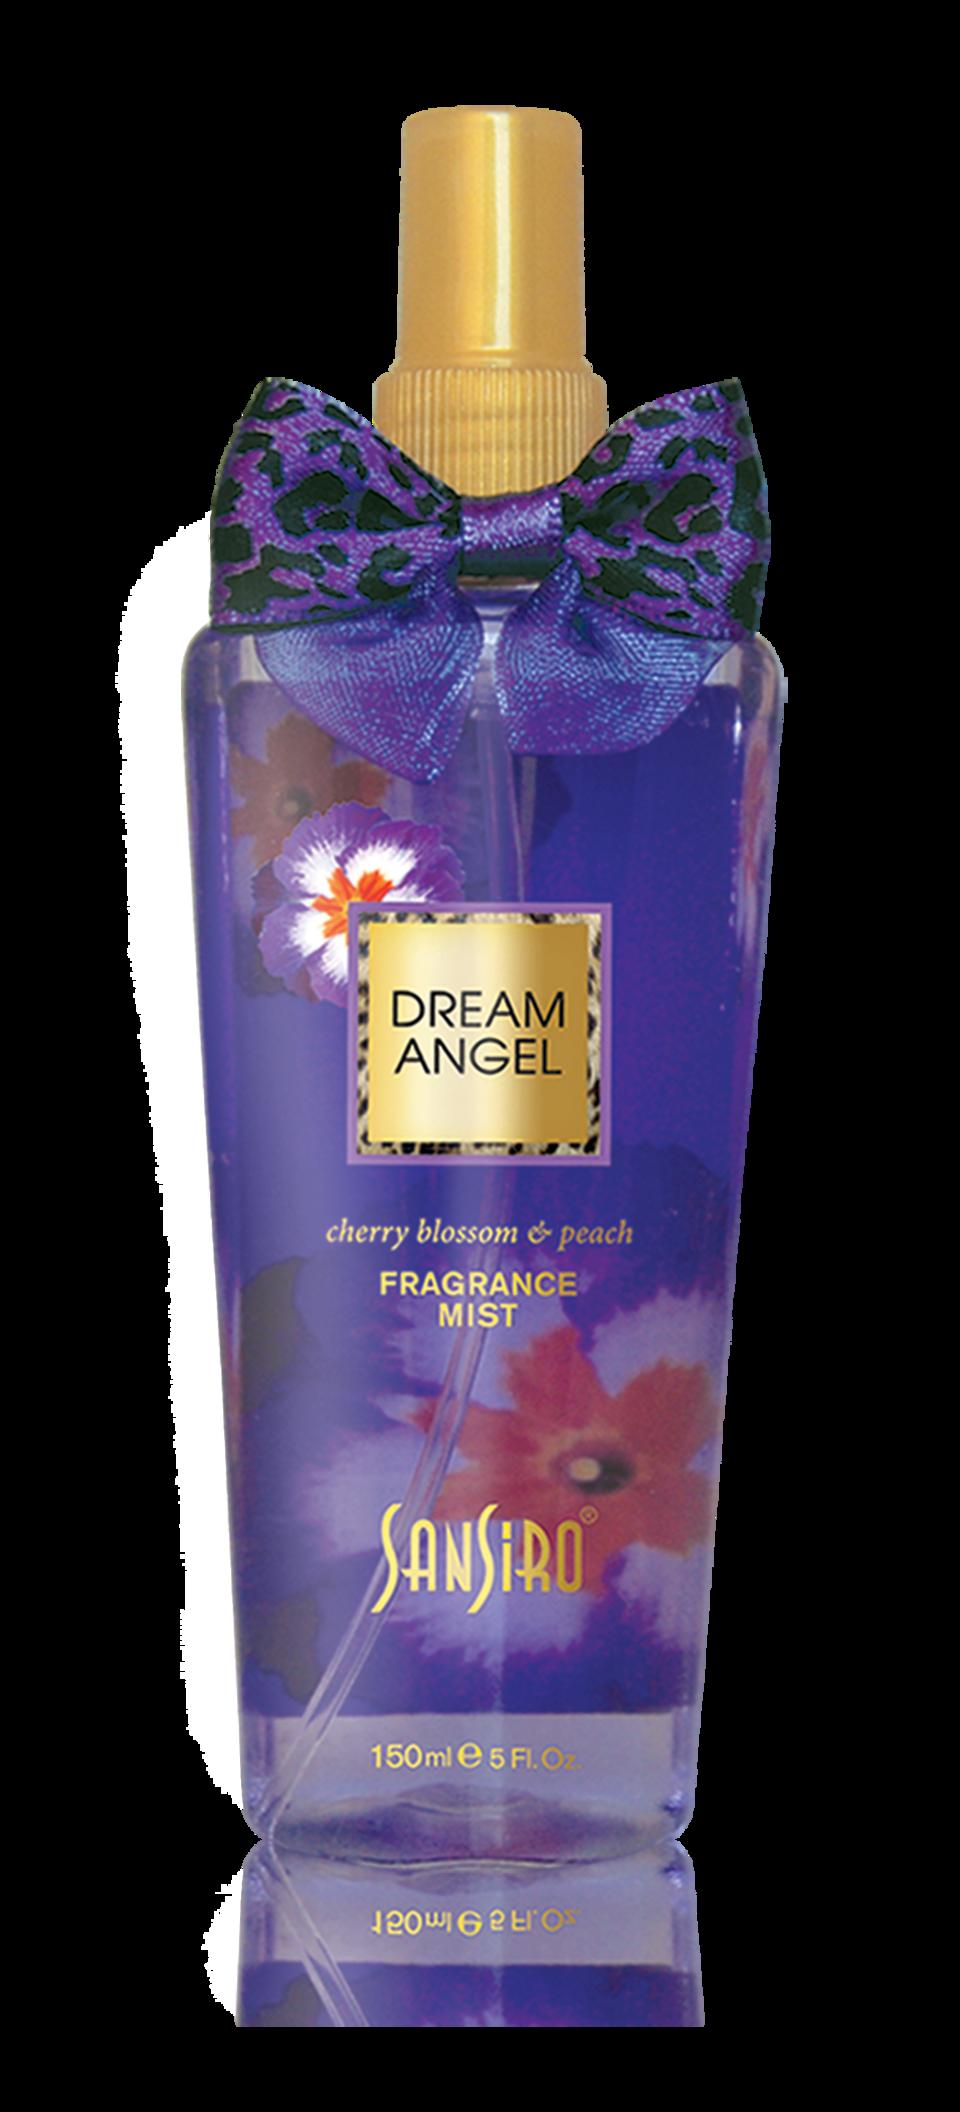 Sansiro Perfume - Body Splash - Fragrance Mist - Dream Angel